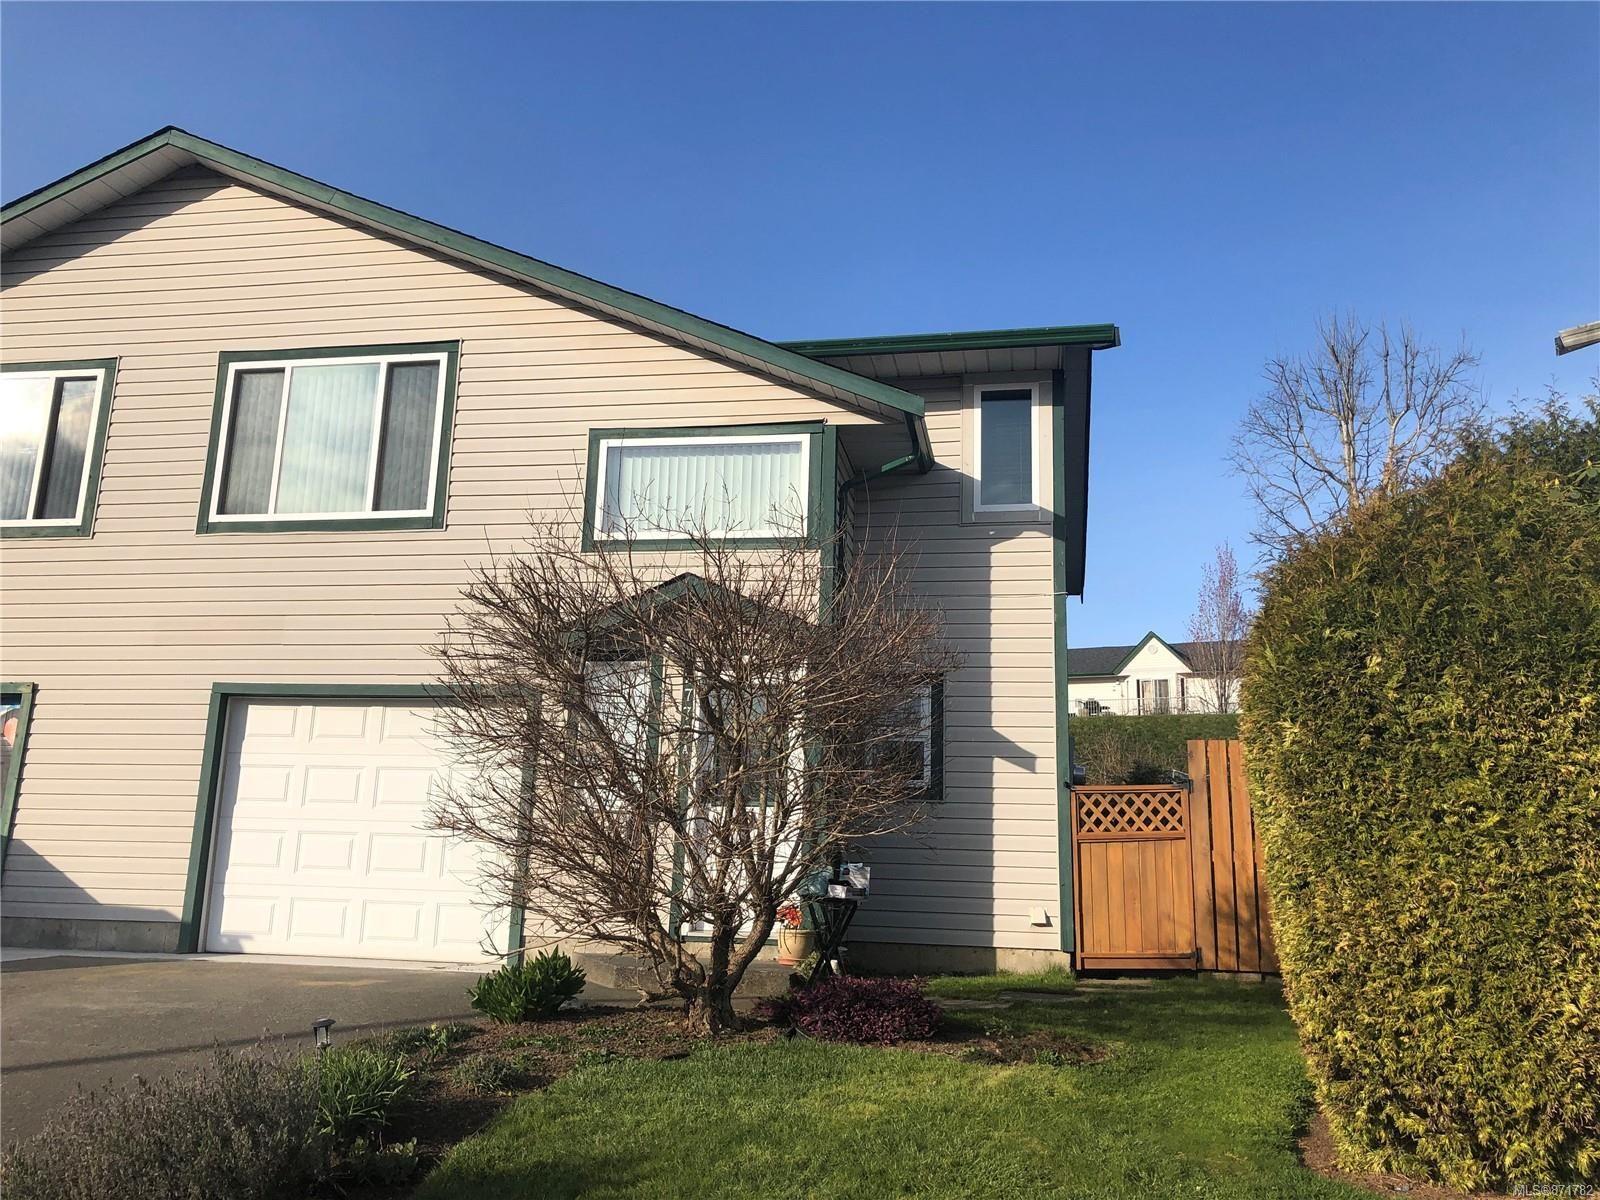 Main Photo: A 2775 Myra Pl in : CV Courtenay East Half Duplex for sale (Comox Valley)  : MLS®# 871782